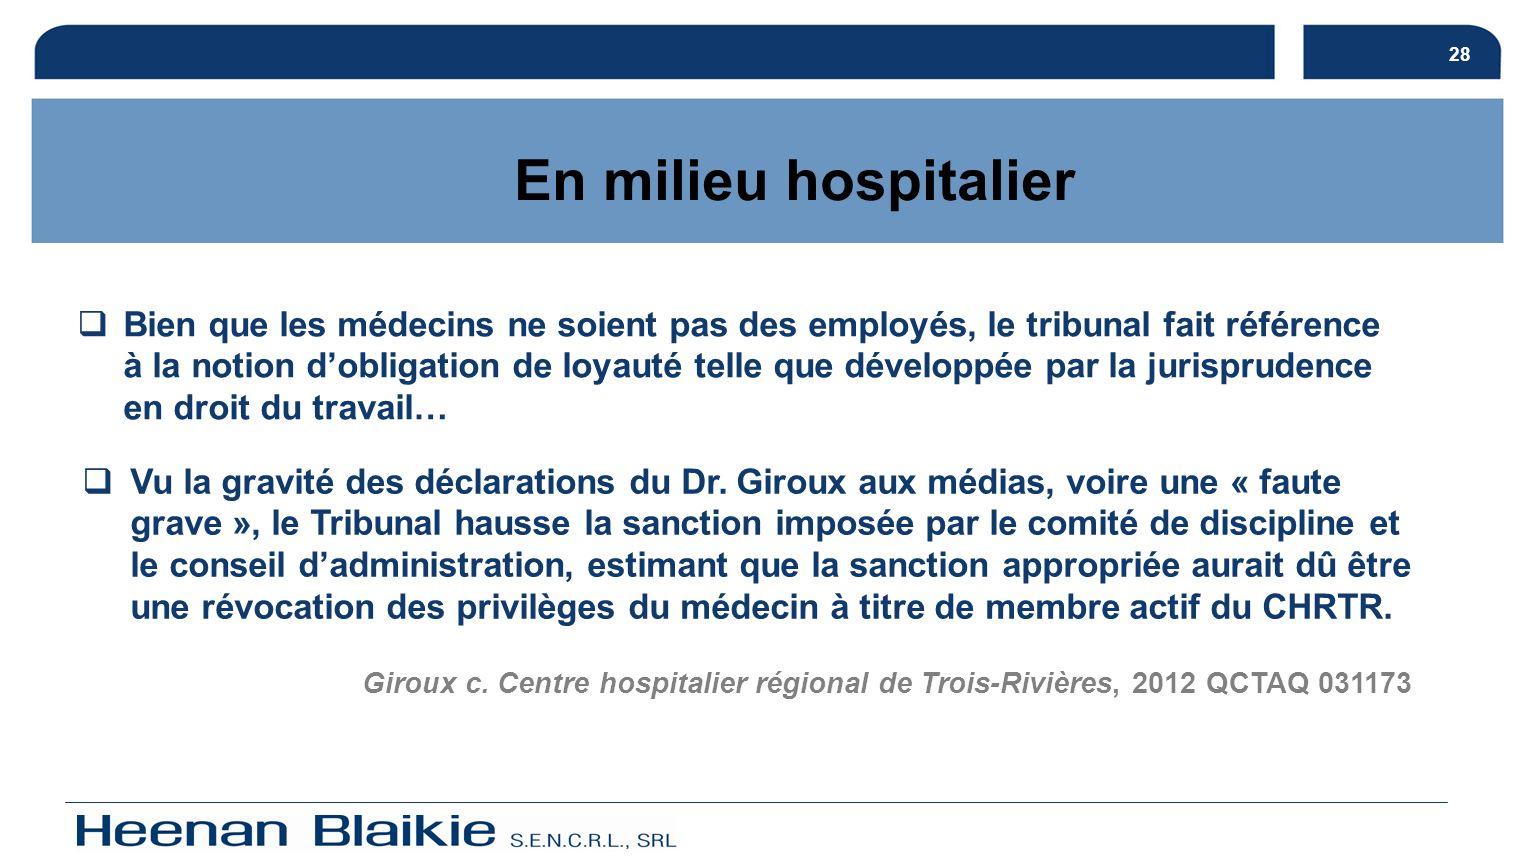 28 En milieu hospitalier.